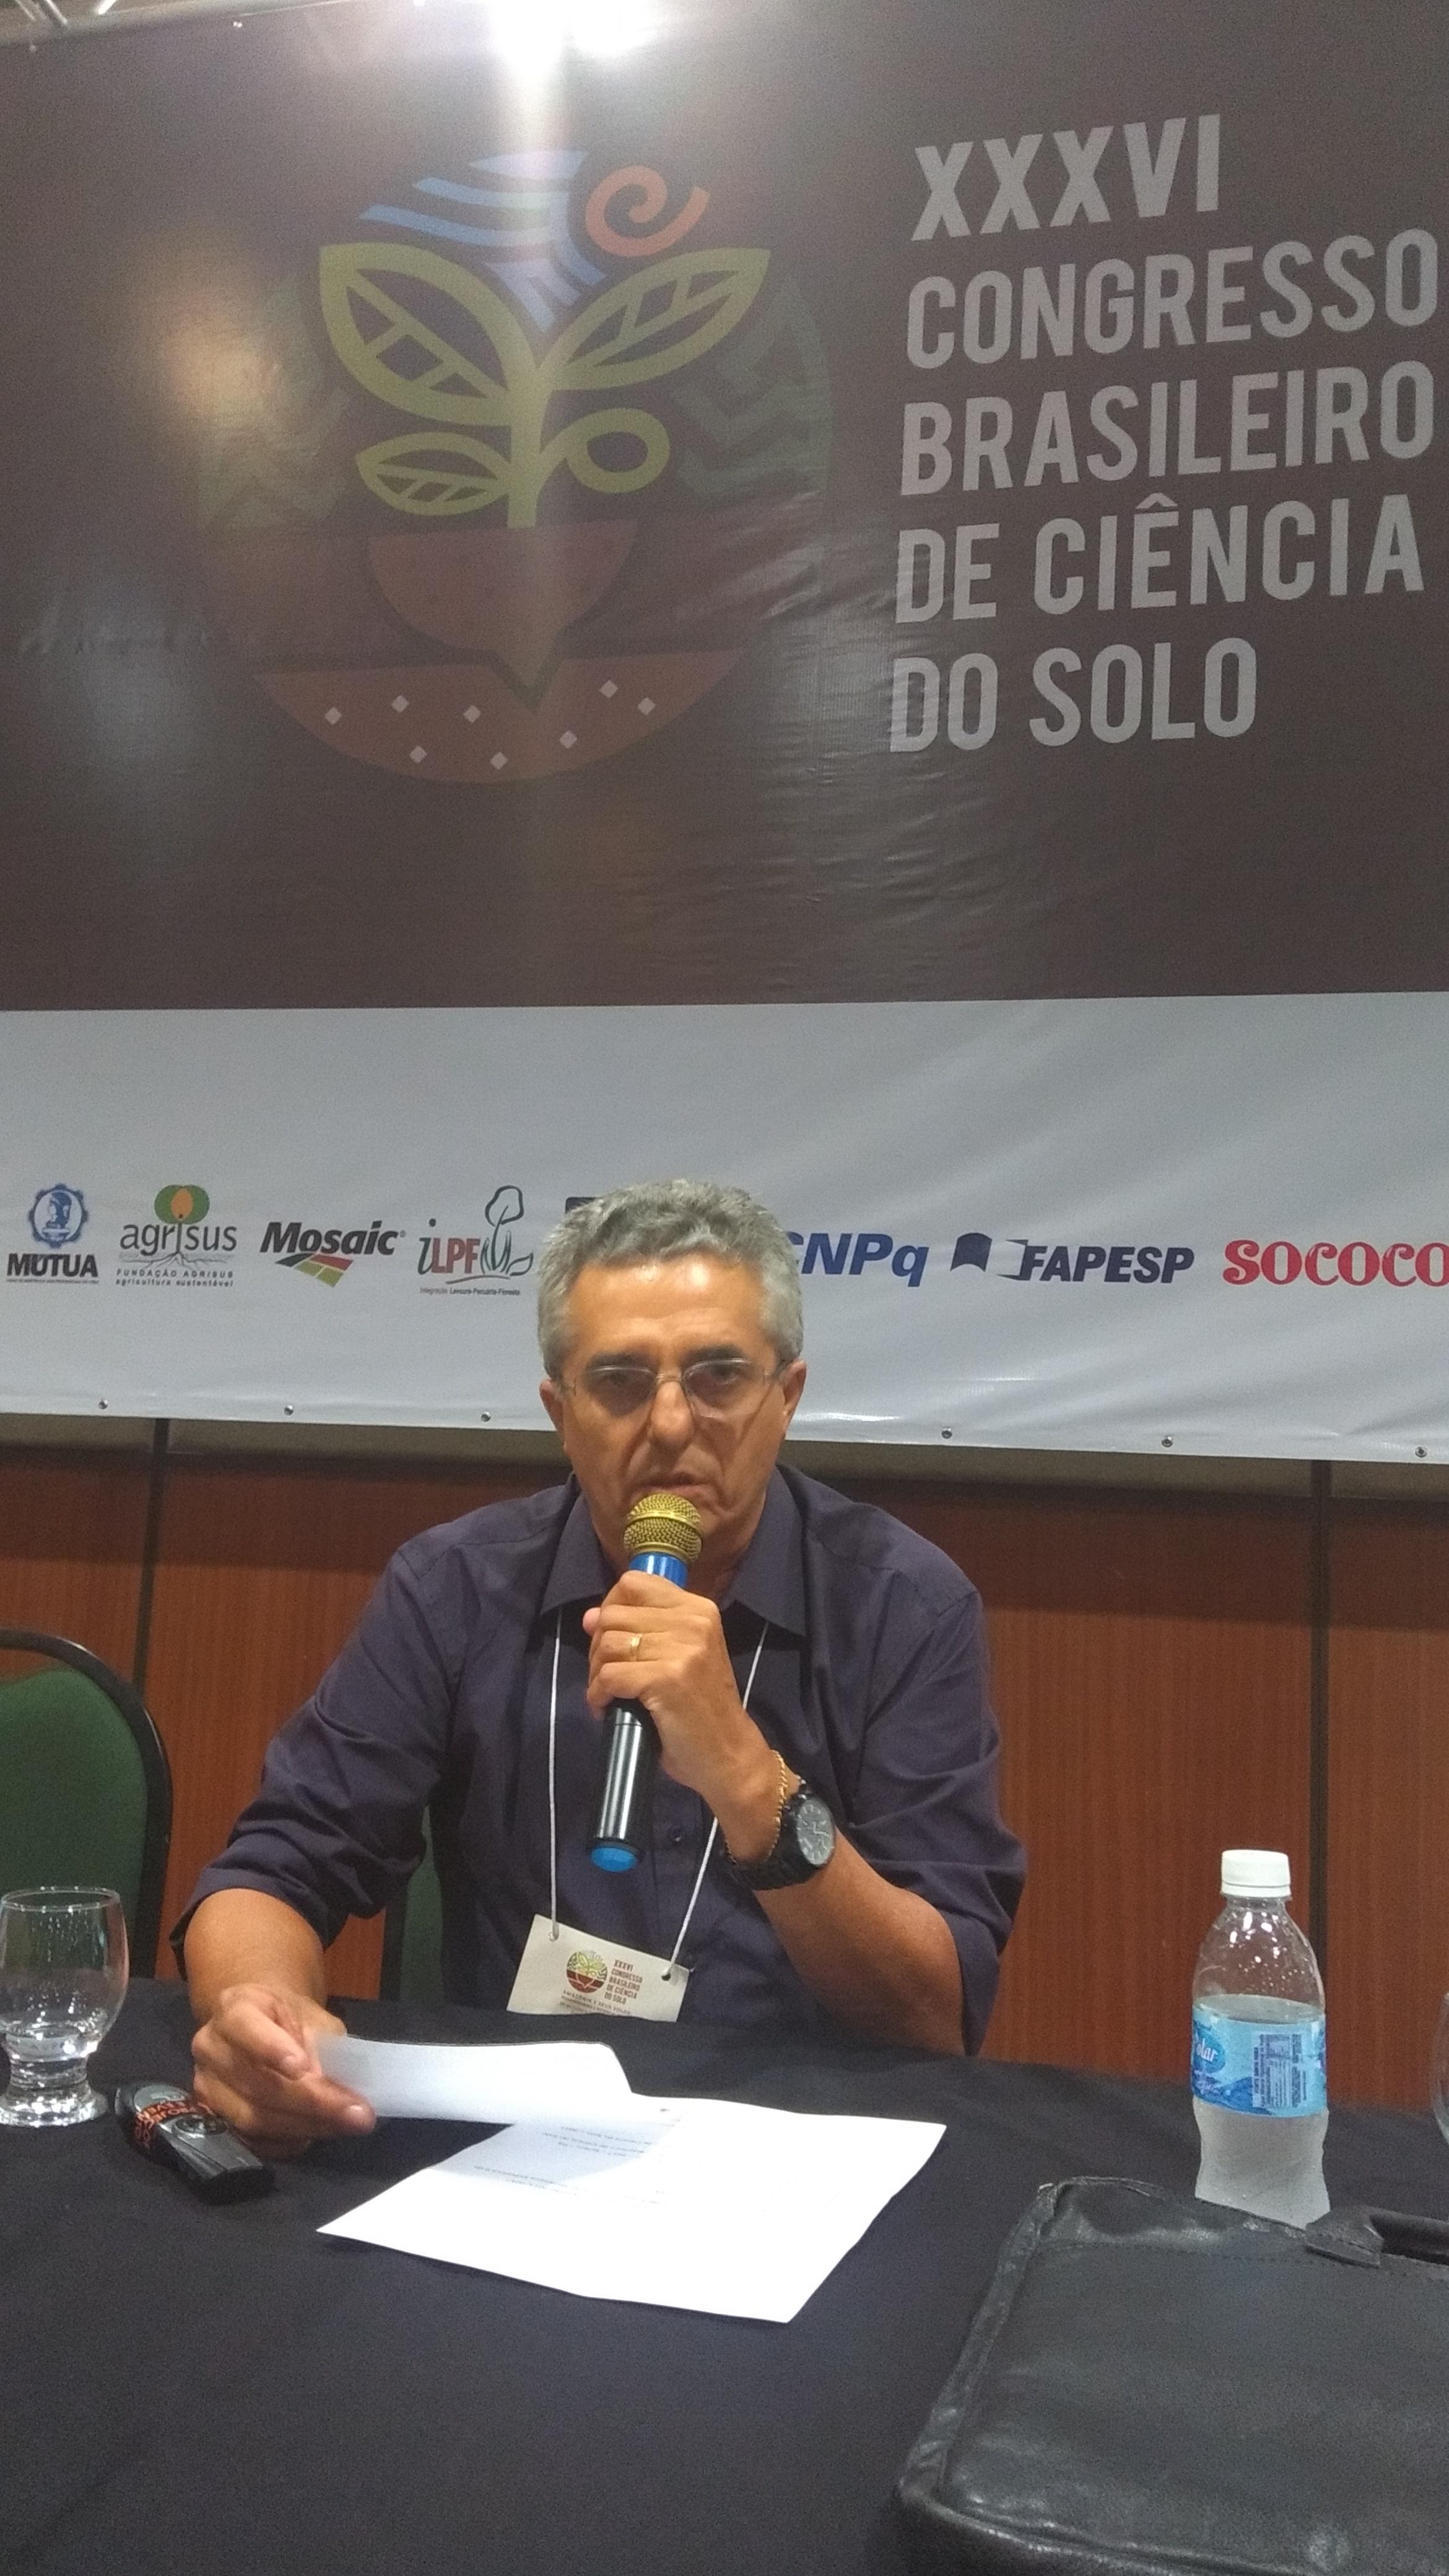 O evento foi presidido pelo professor da UFRPA, Antonio Rodrigues